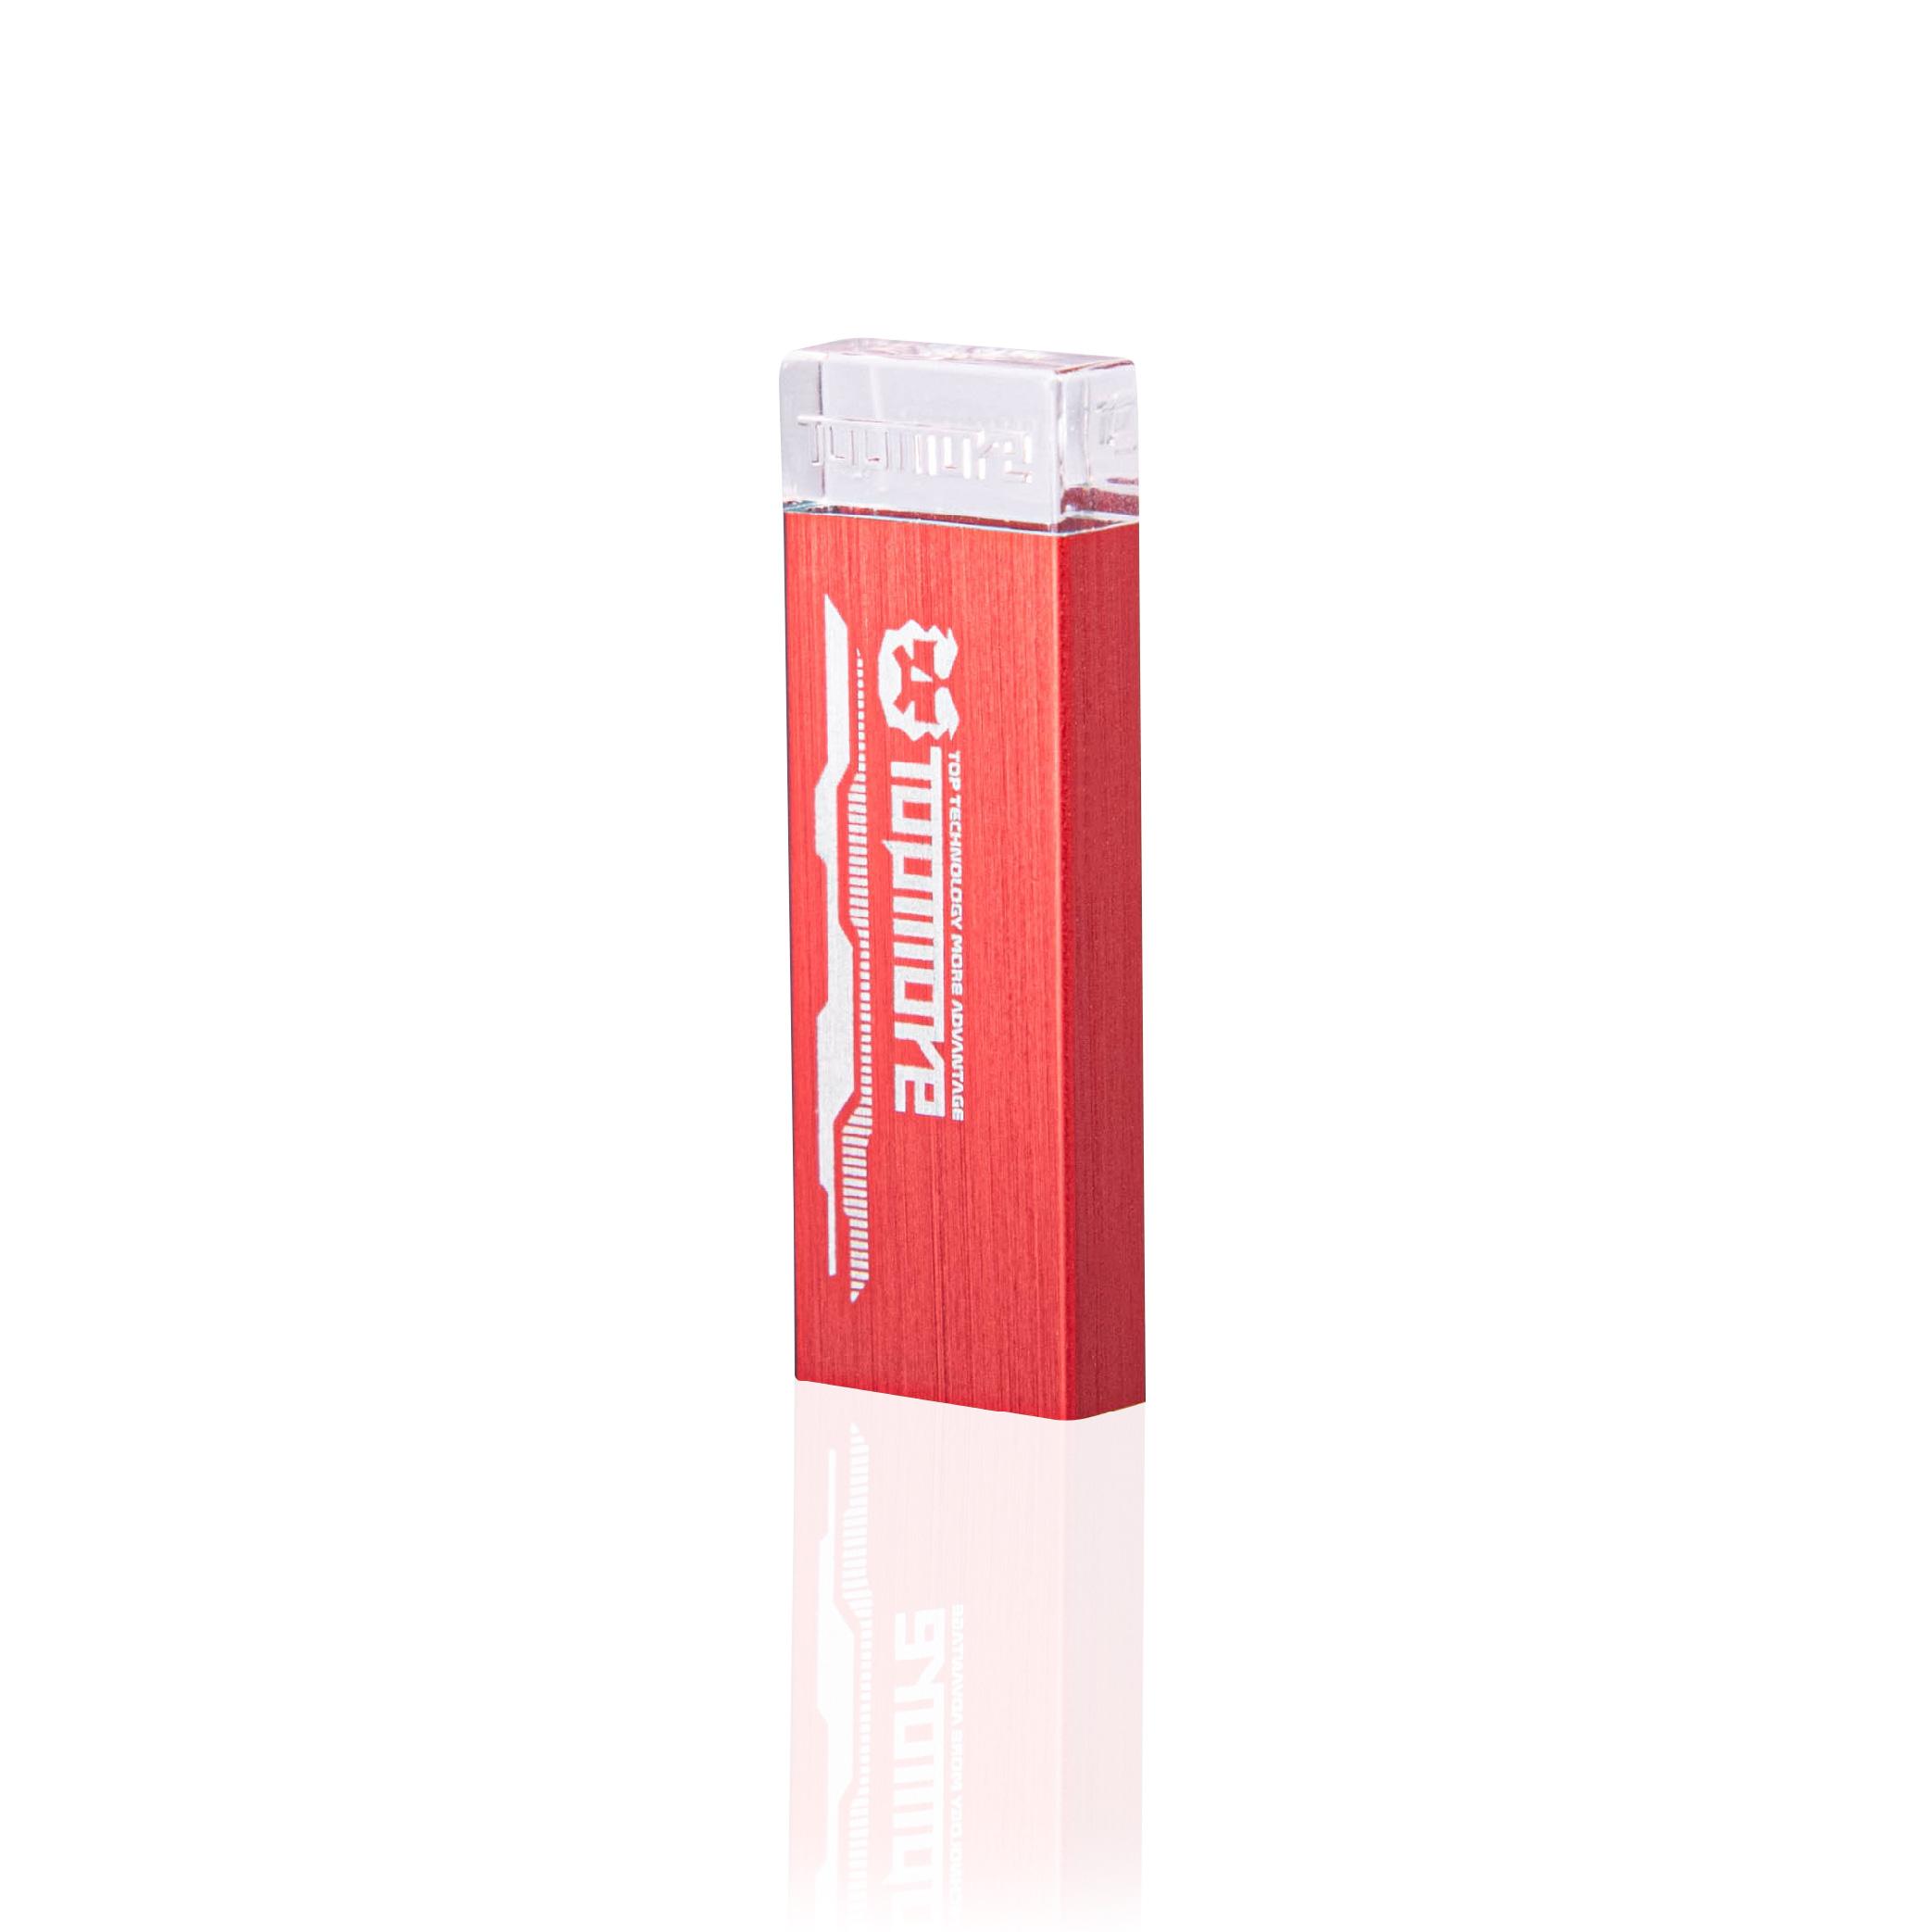 Topmore 達墨系列AI發光隨身碟 USB3.0 64GB-紅色